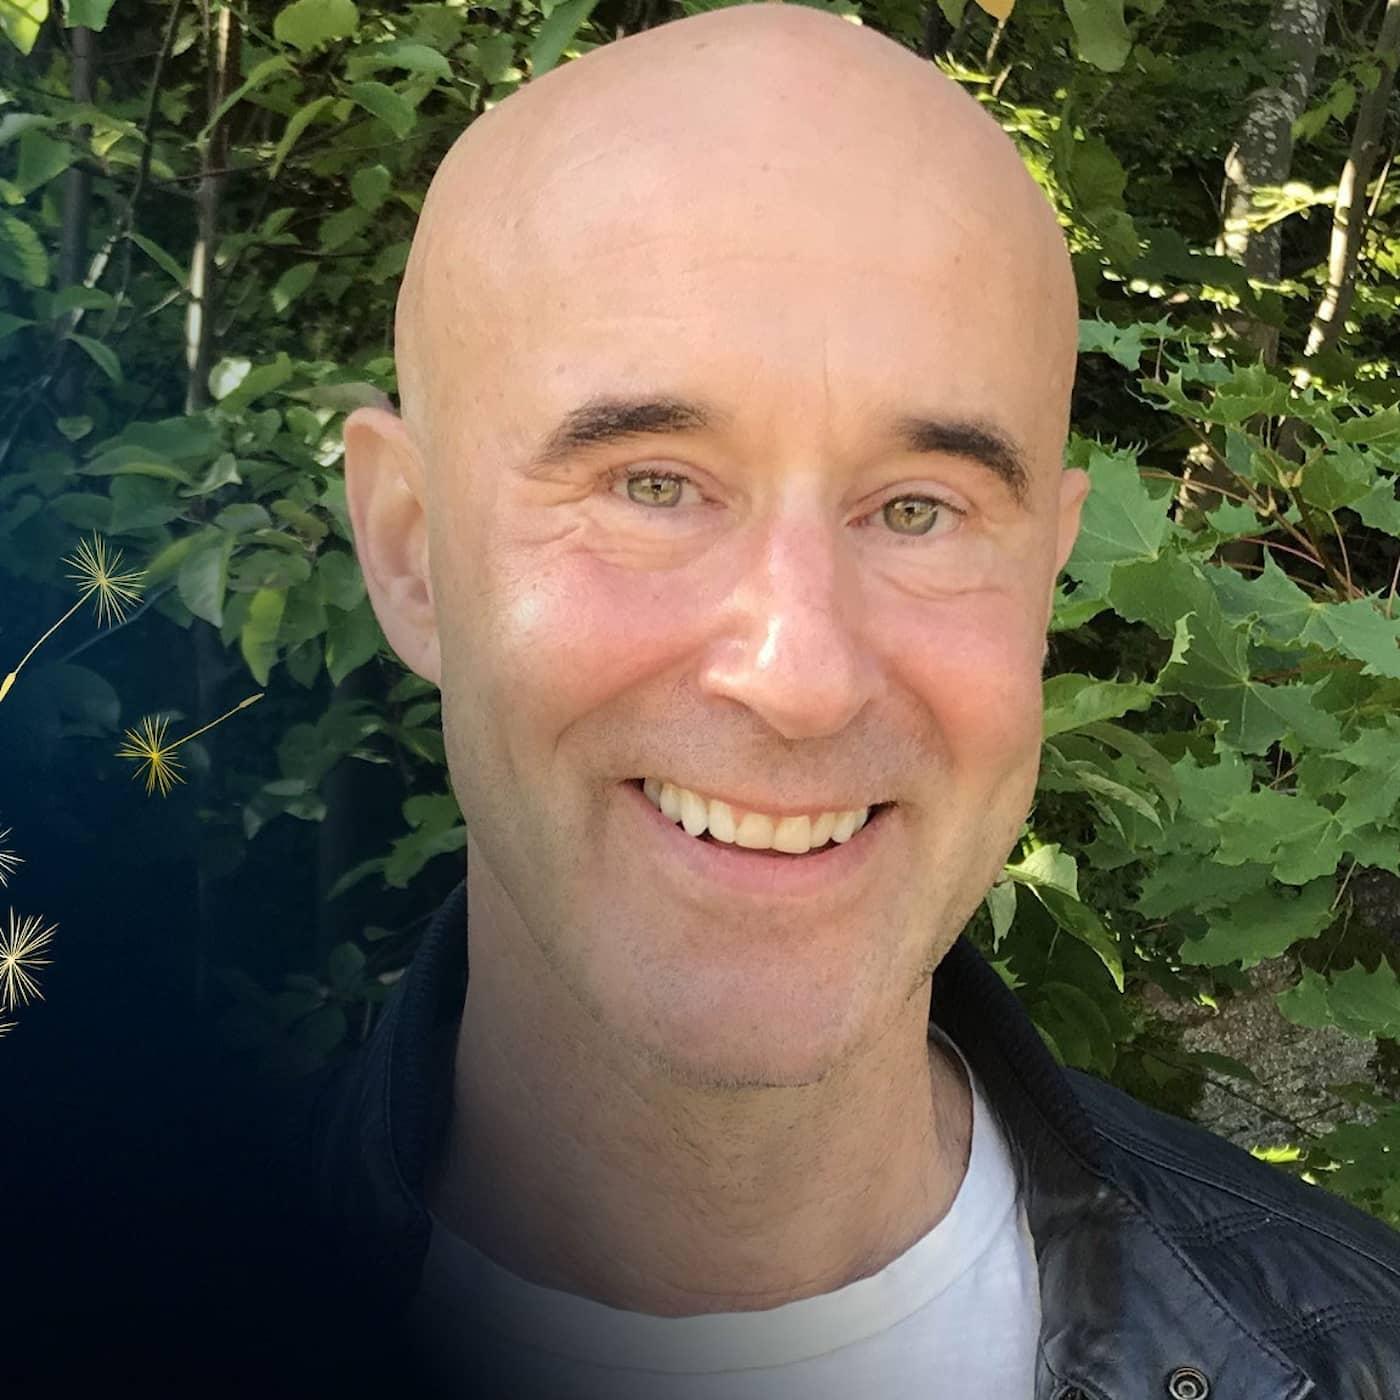 Mark Levengood - Vilse bland alternativa sanningar